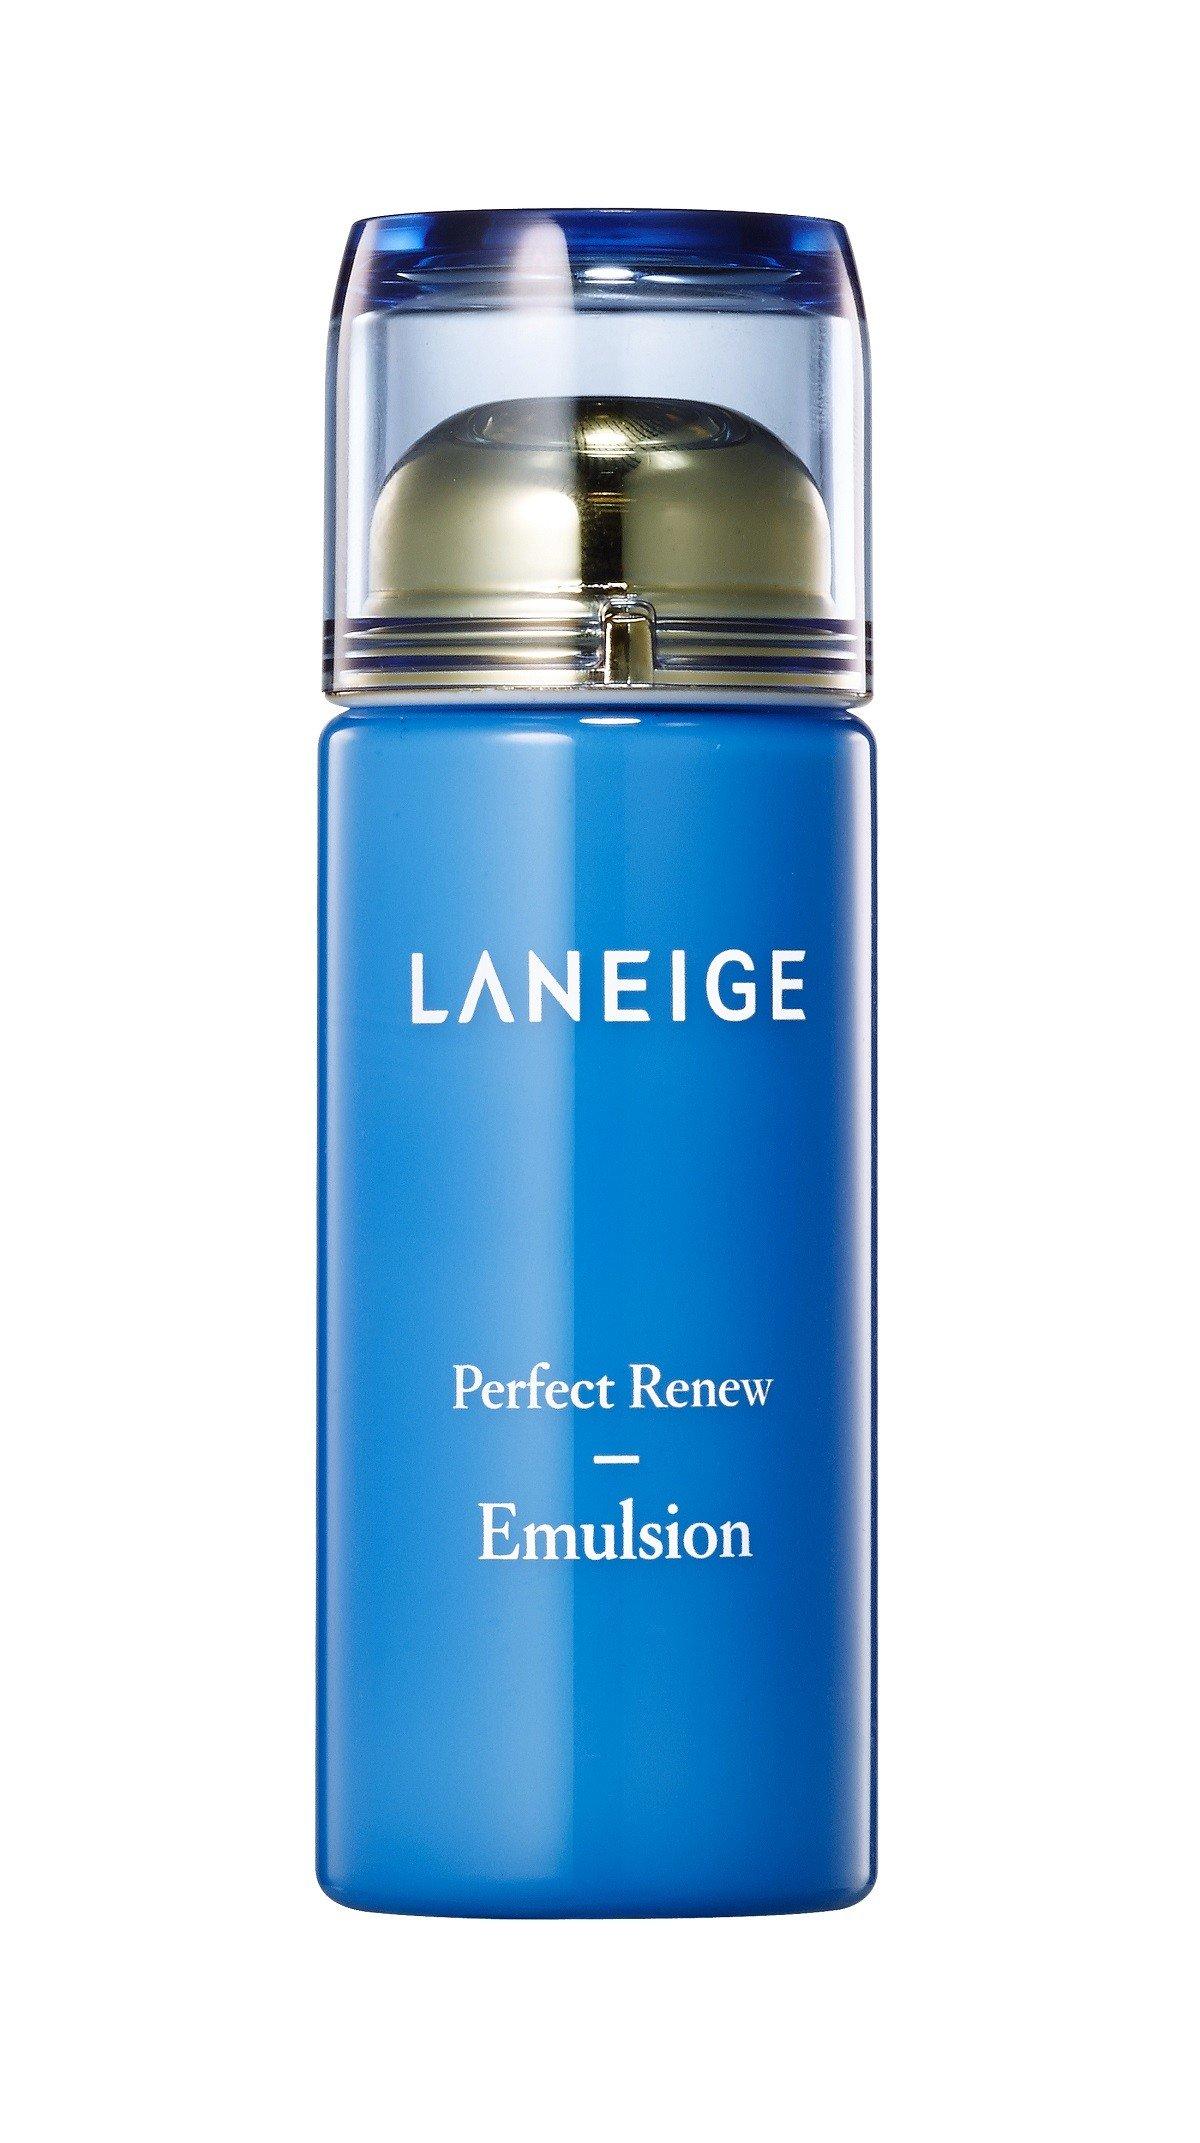 LANEIGE Perfect Renew Emulsion